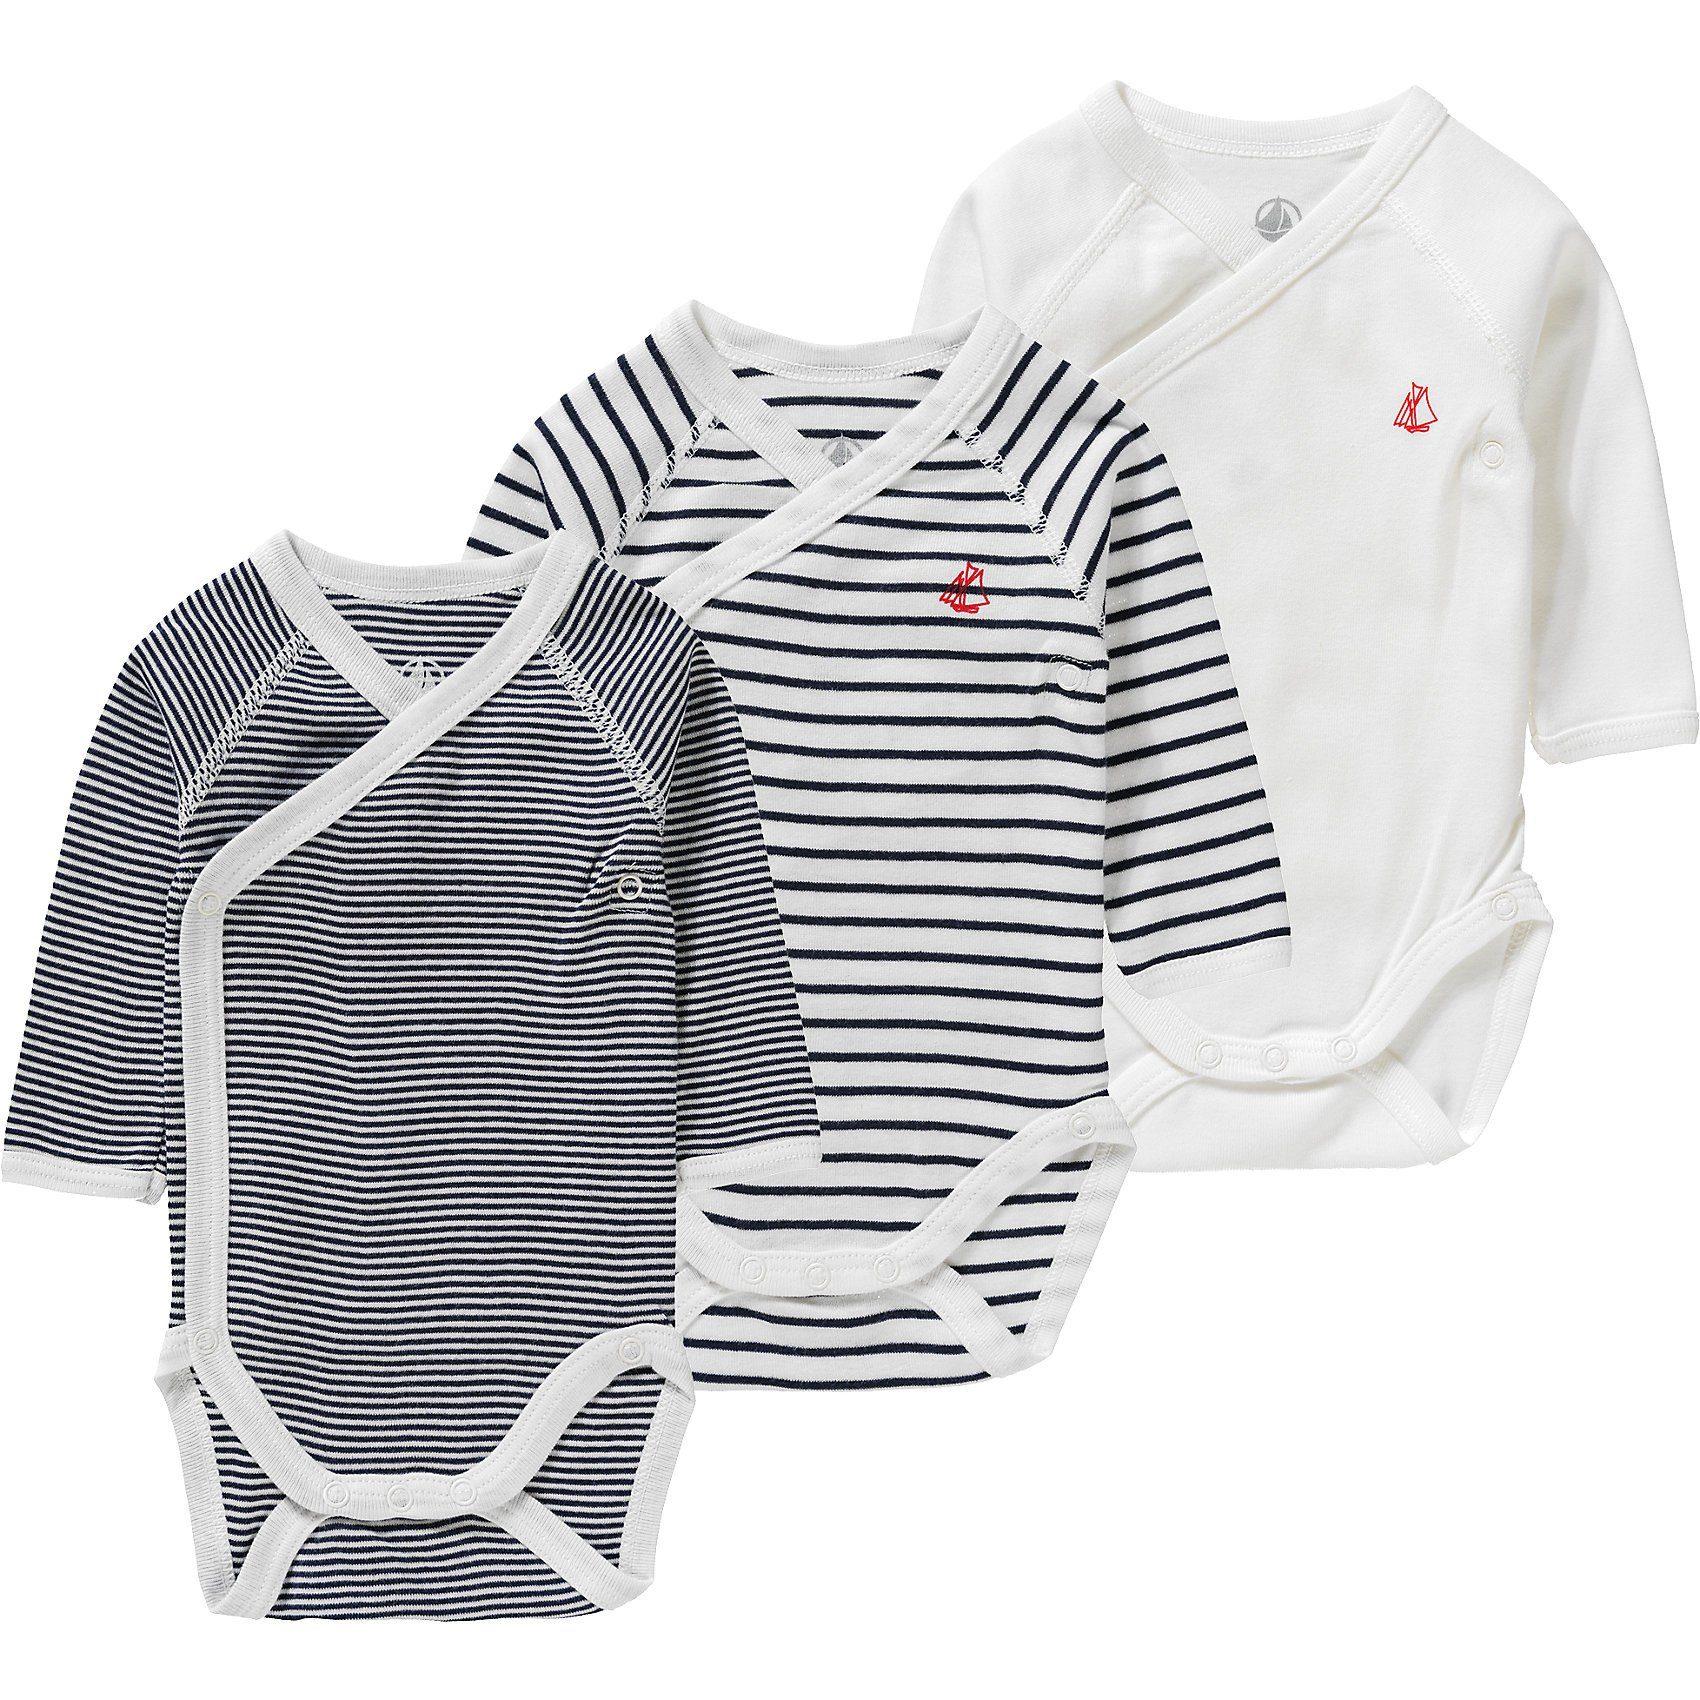 Shirt Long-Shirt Pailletten Applikation Heine lila beere Viskose Gr 40 42